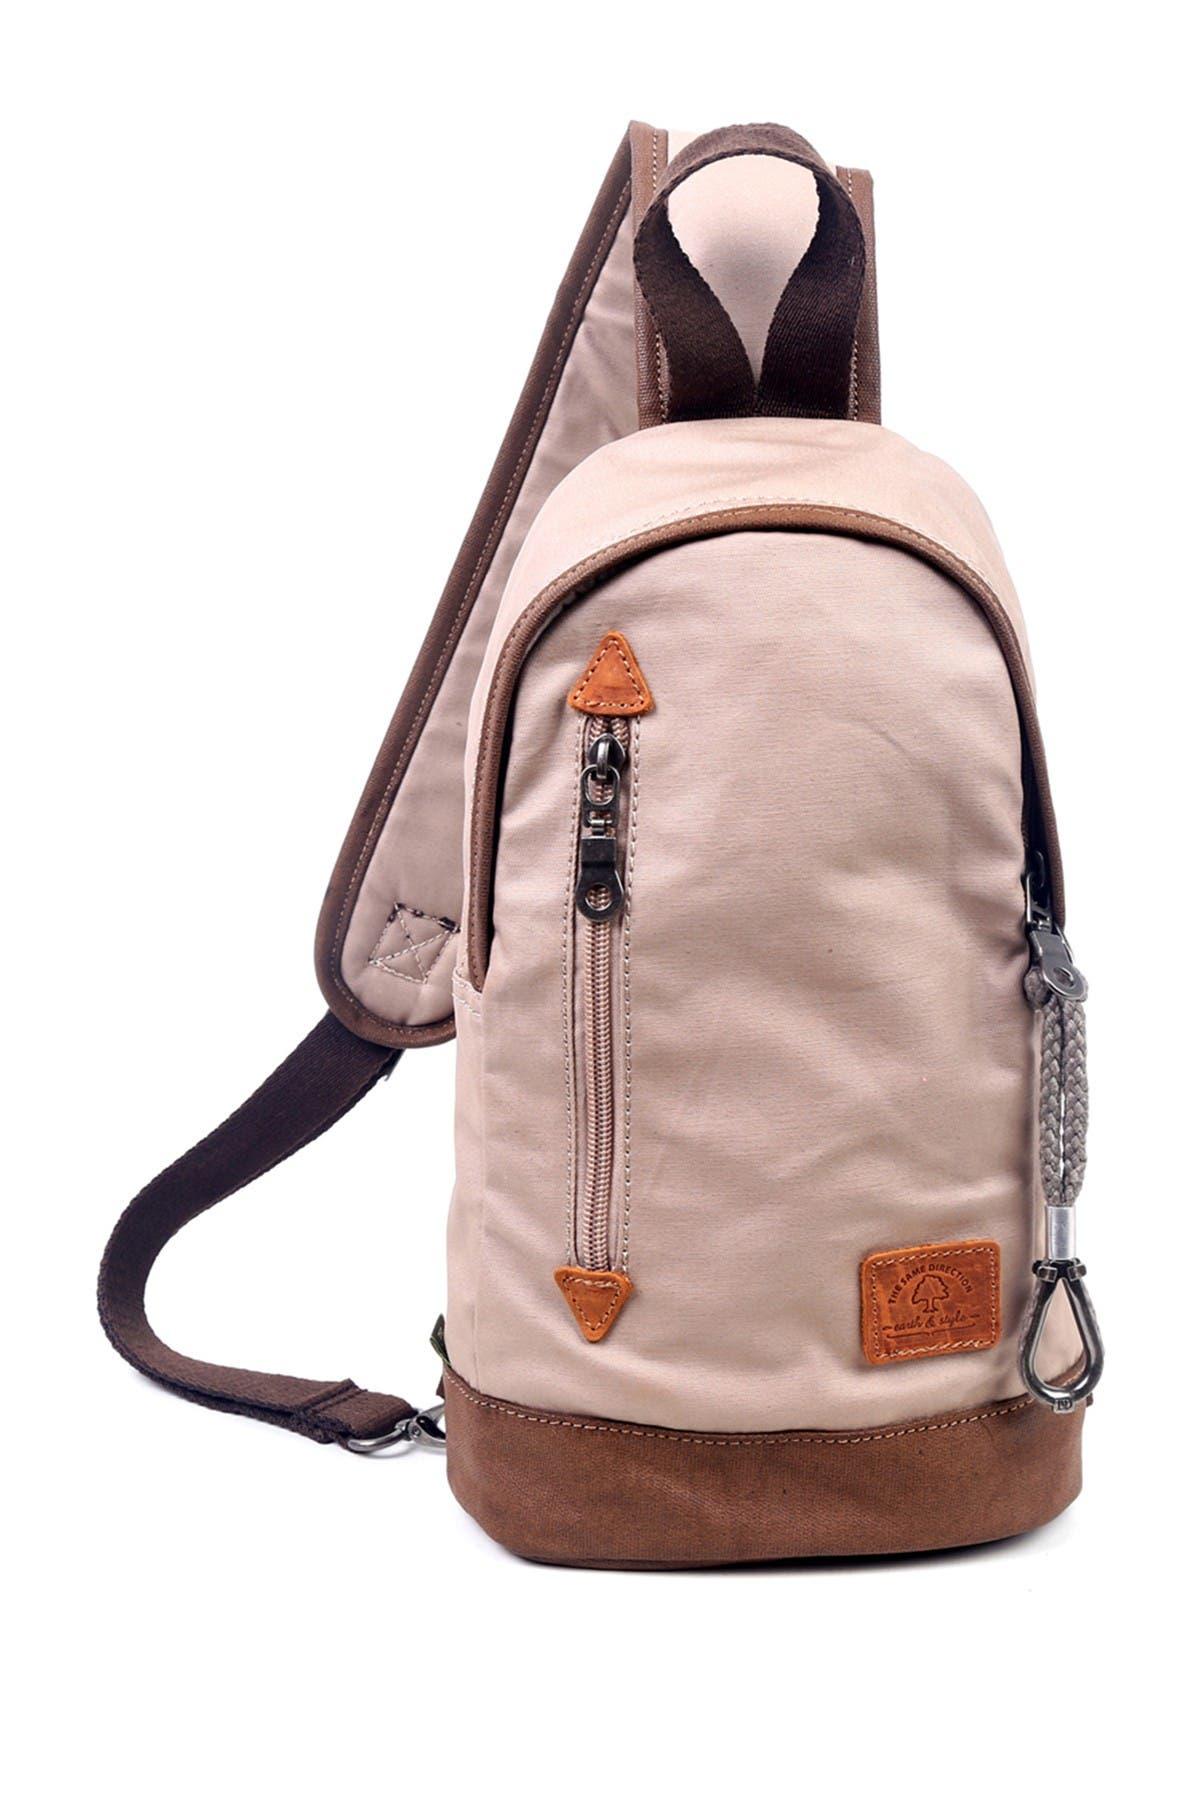 Image of TSD Light Coated Canvas Sling Bag